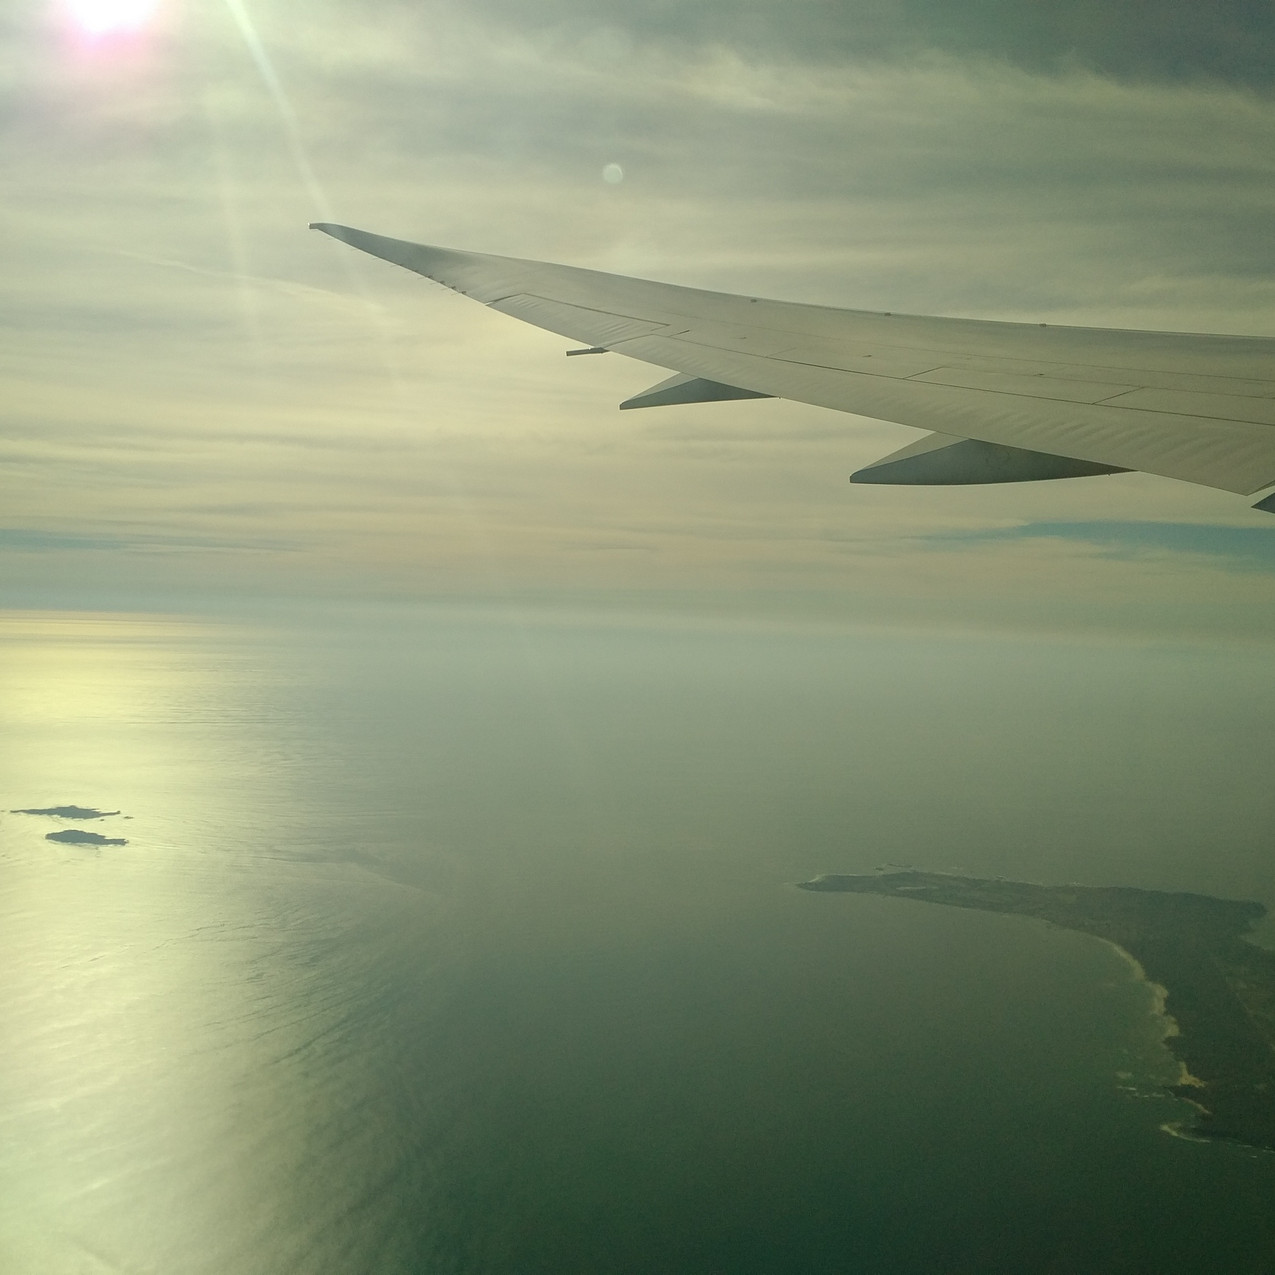 Boeing 787 Dreamliner window no tint